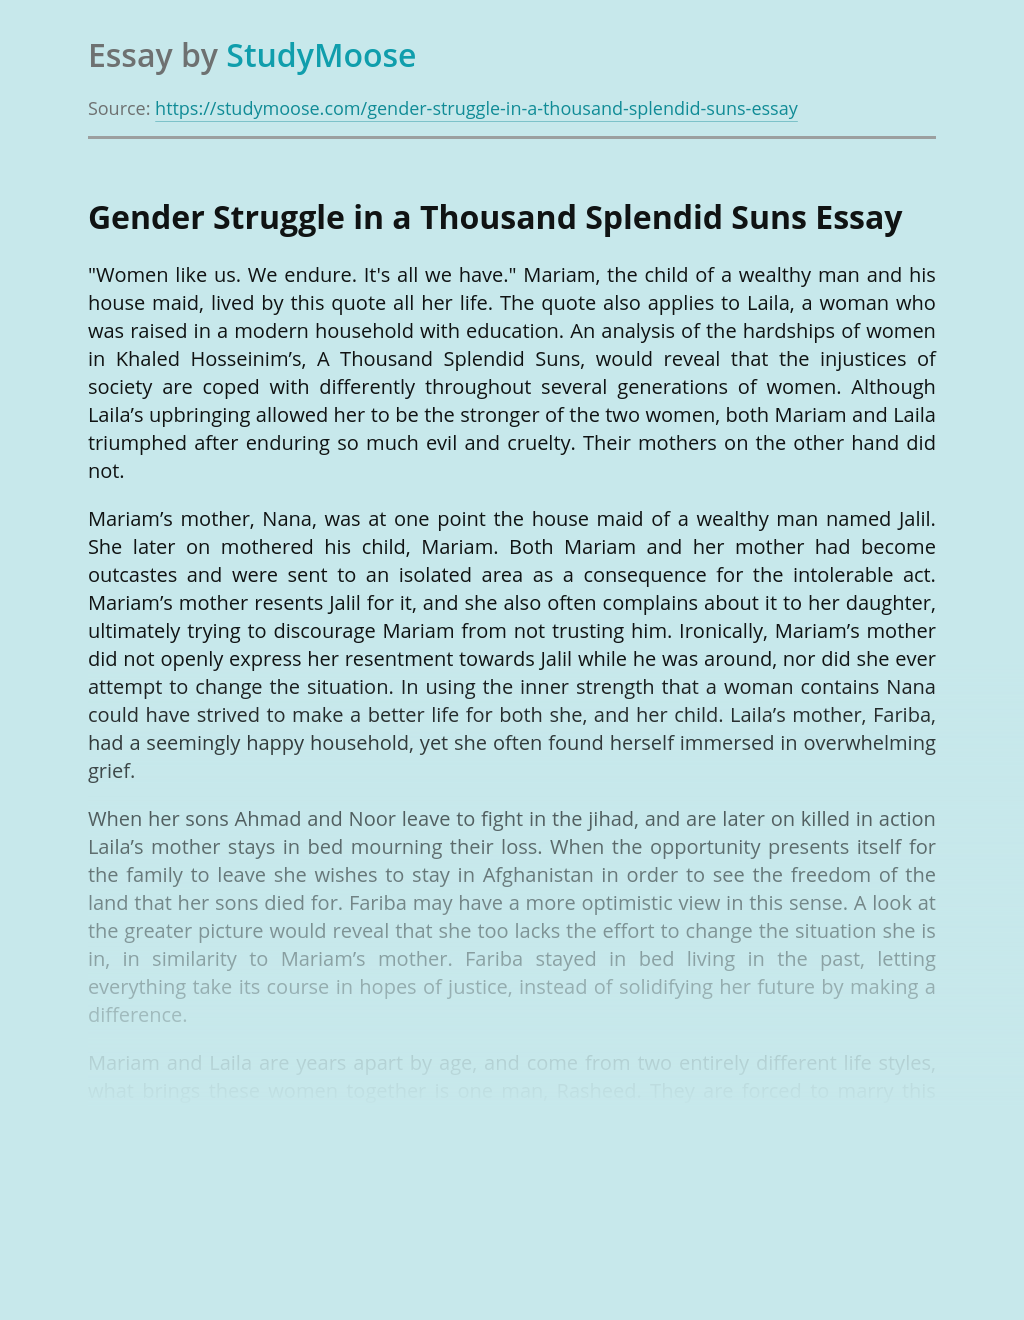 Gender Struggle in a Thousand Splendid Suns